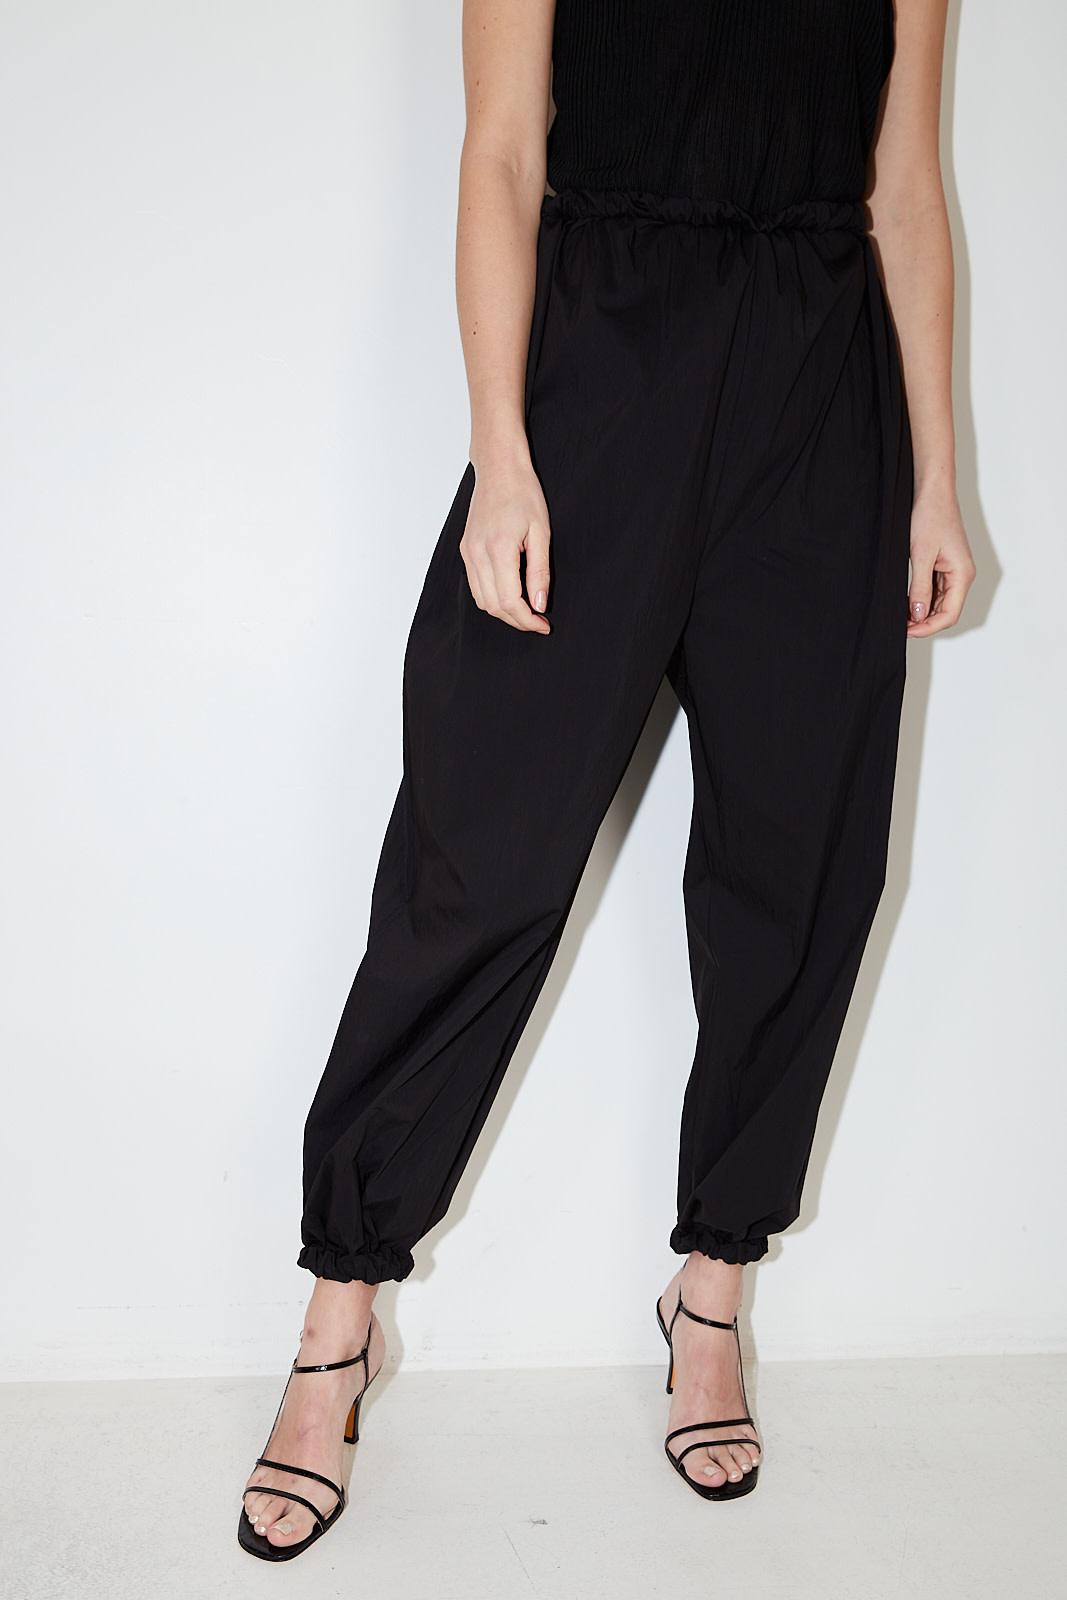 Aeron - Coupe cotton blend pants